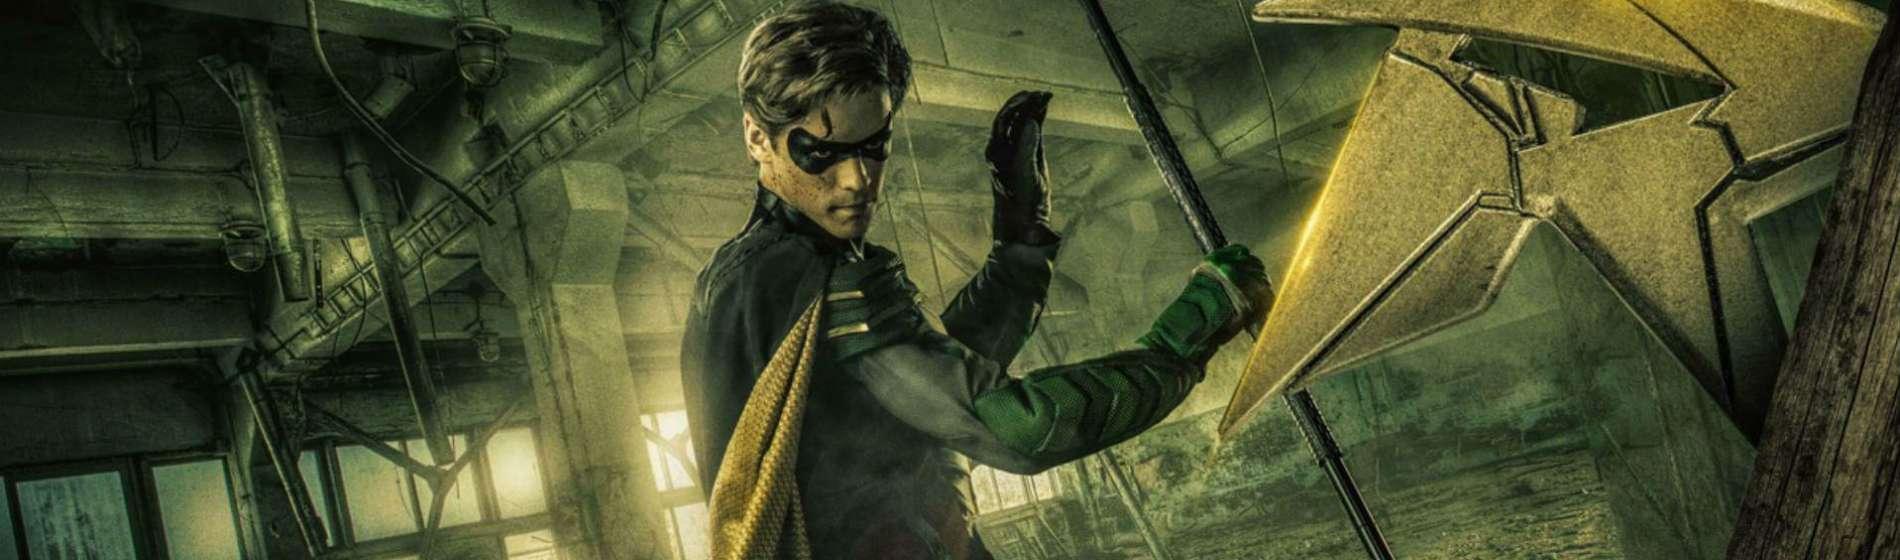 Titans-Feature-Image-Robin